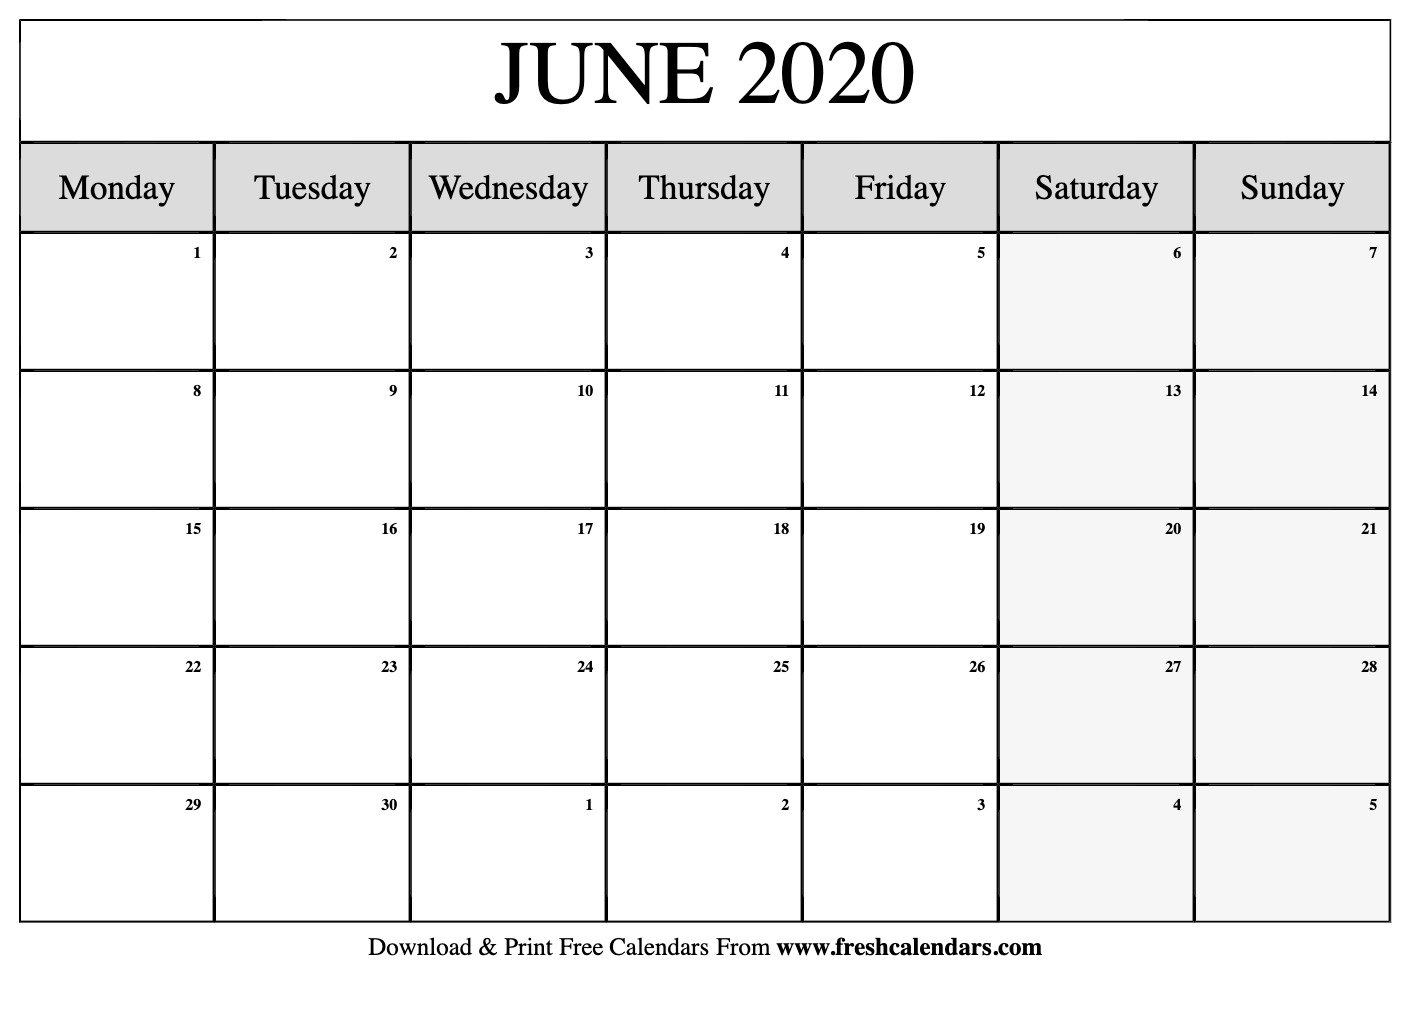 Free Printable June 2020 Calendars May Calendar Starting On Monday